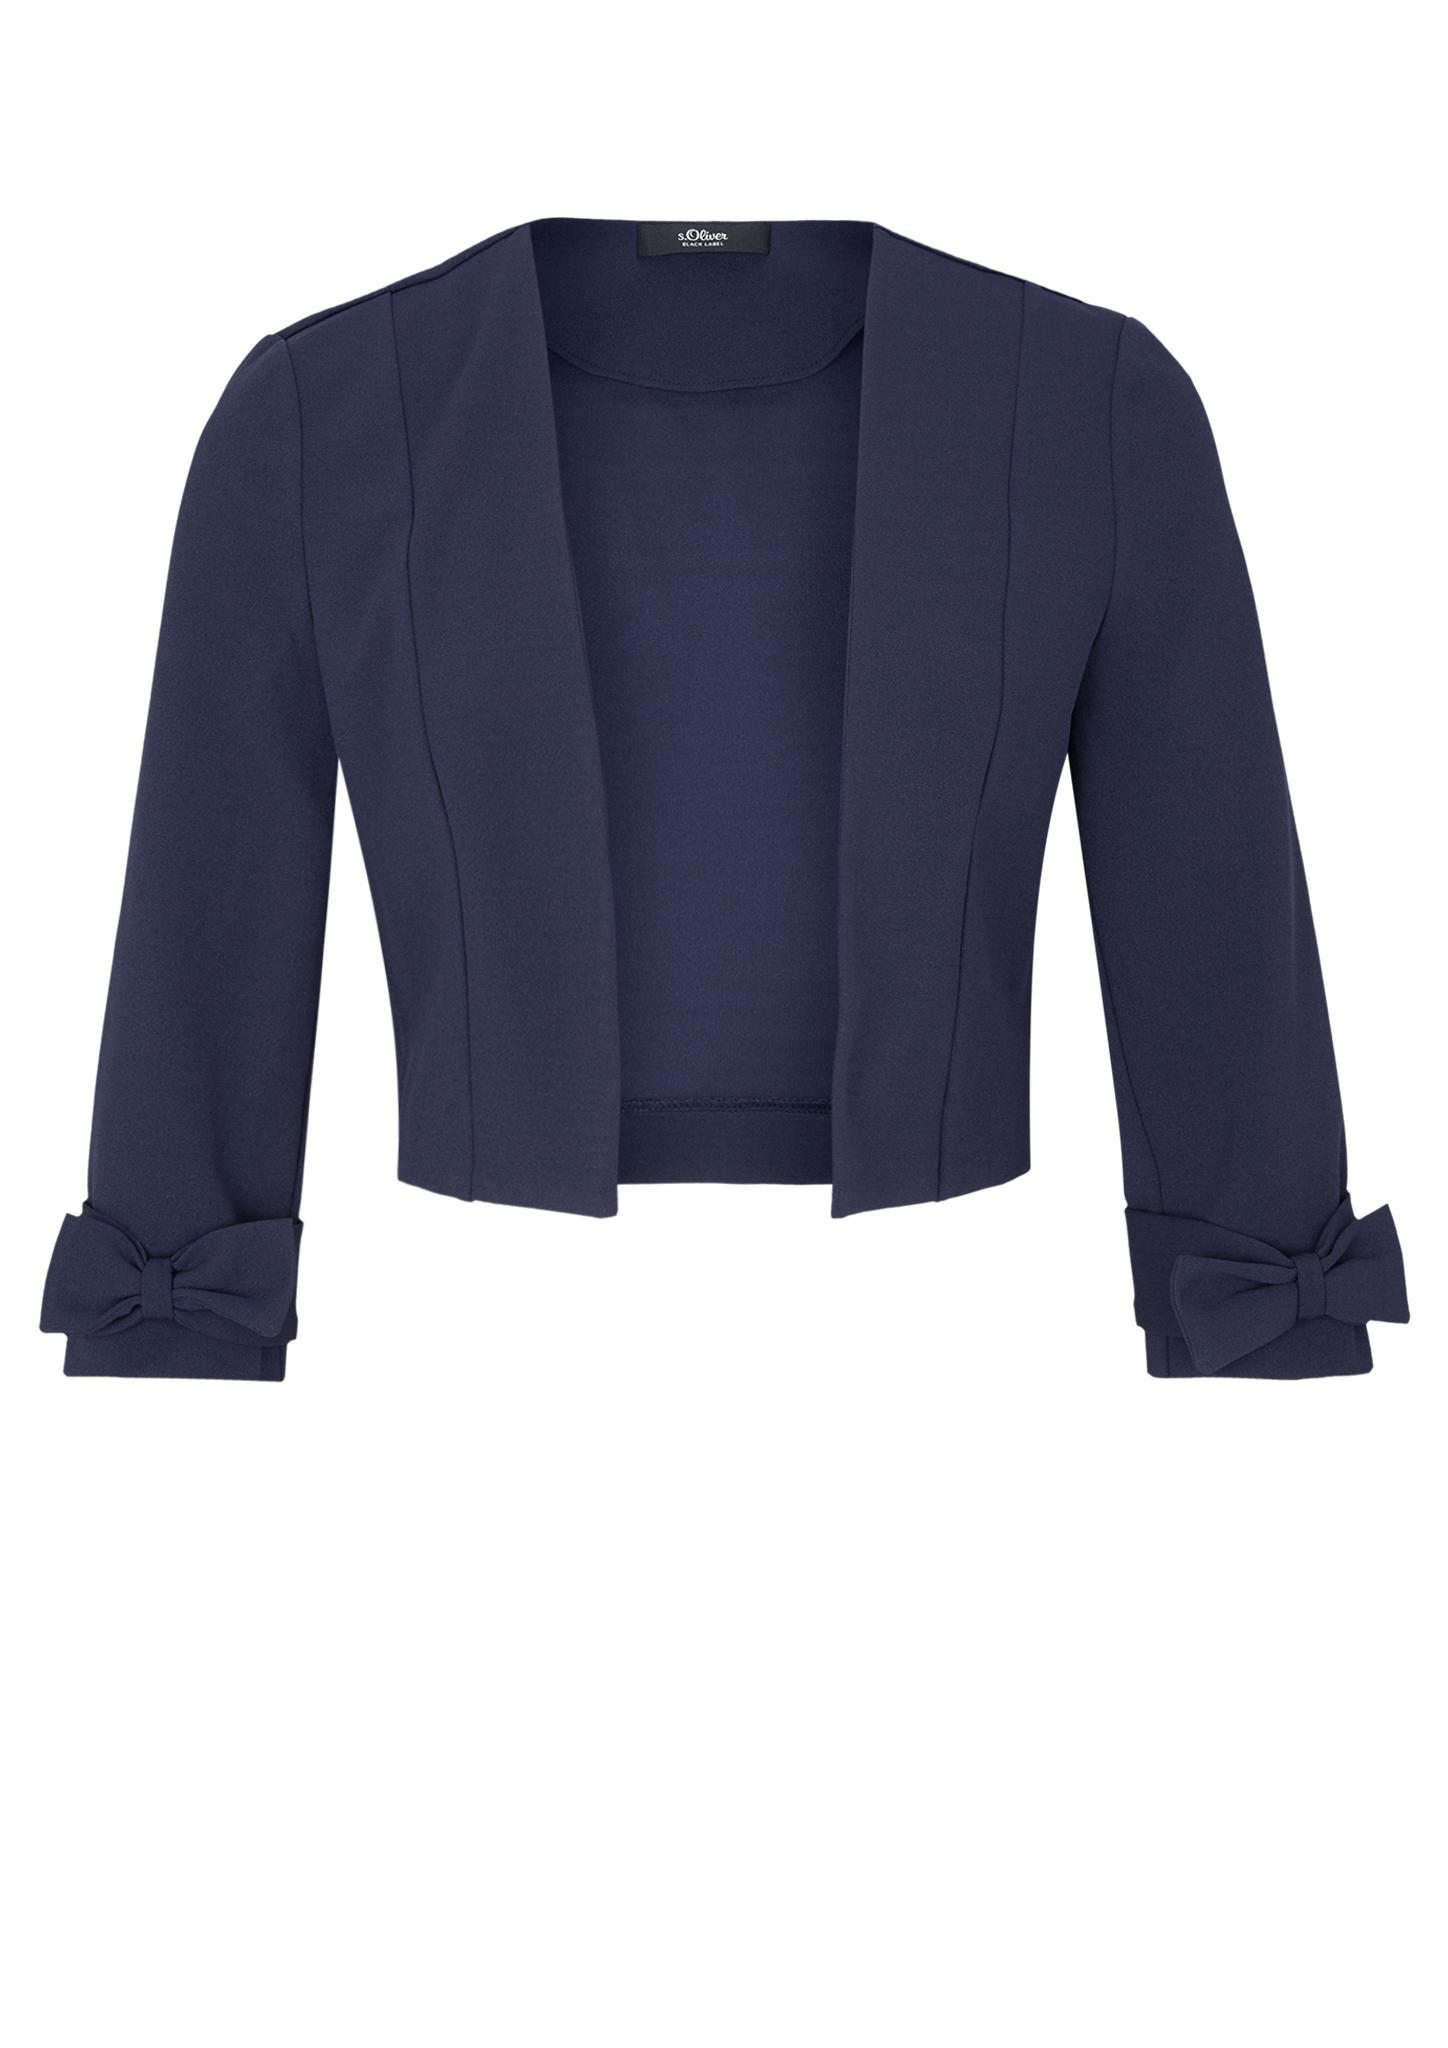 Bolero | Bekleidung > Jacken > Boleros | Blau | 95% polyester -  5% elasthan | s.Oliver BLACK LABEL